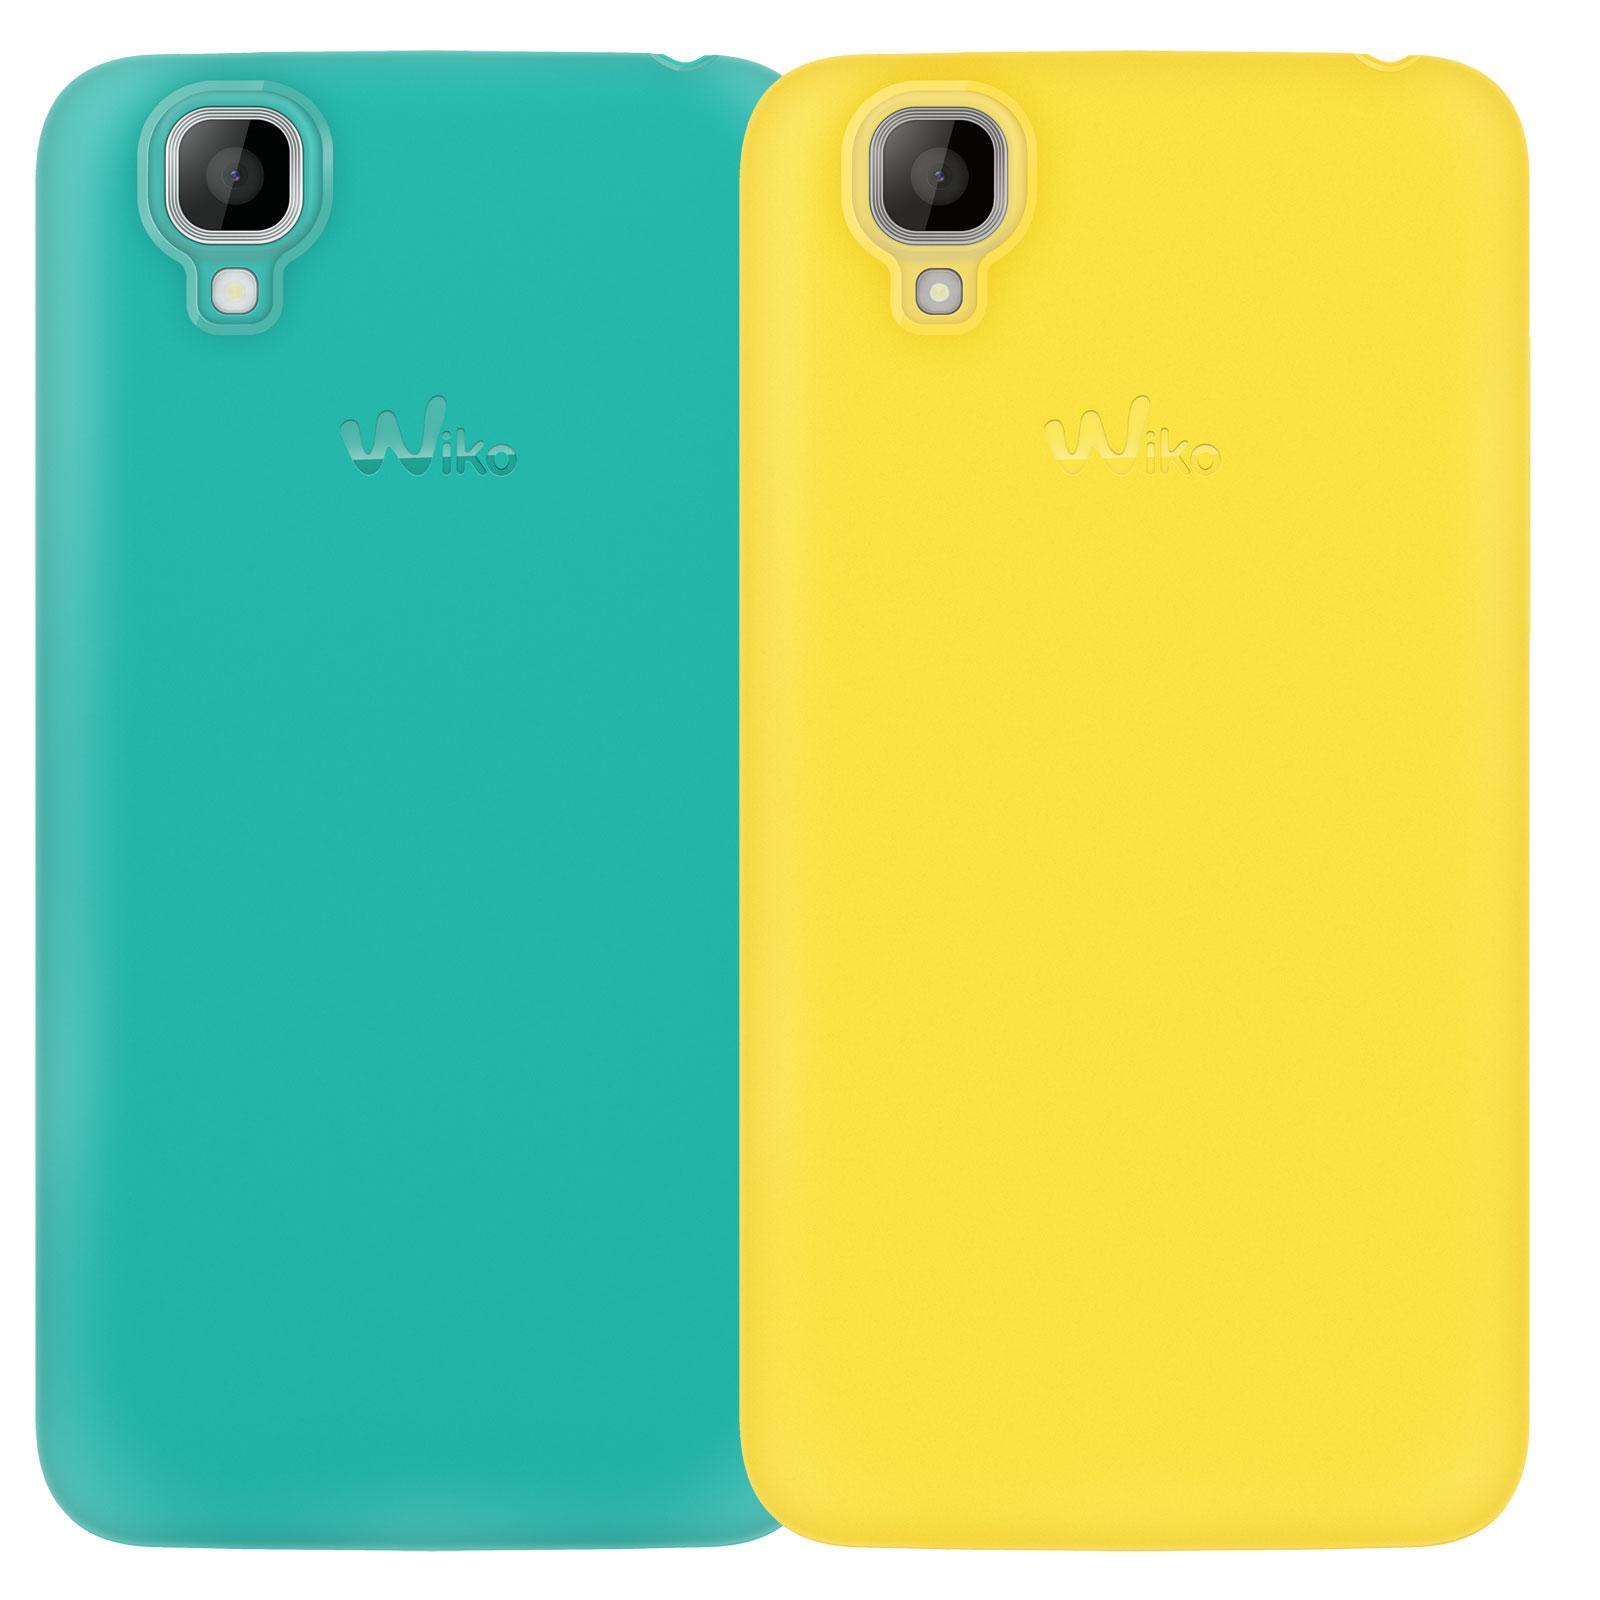 Coque smartphone Wiko 2 coques Fuschia et Turquoise pour Wiko Goa 9XJYNUZtA